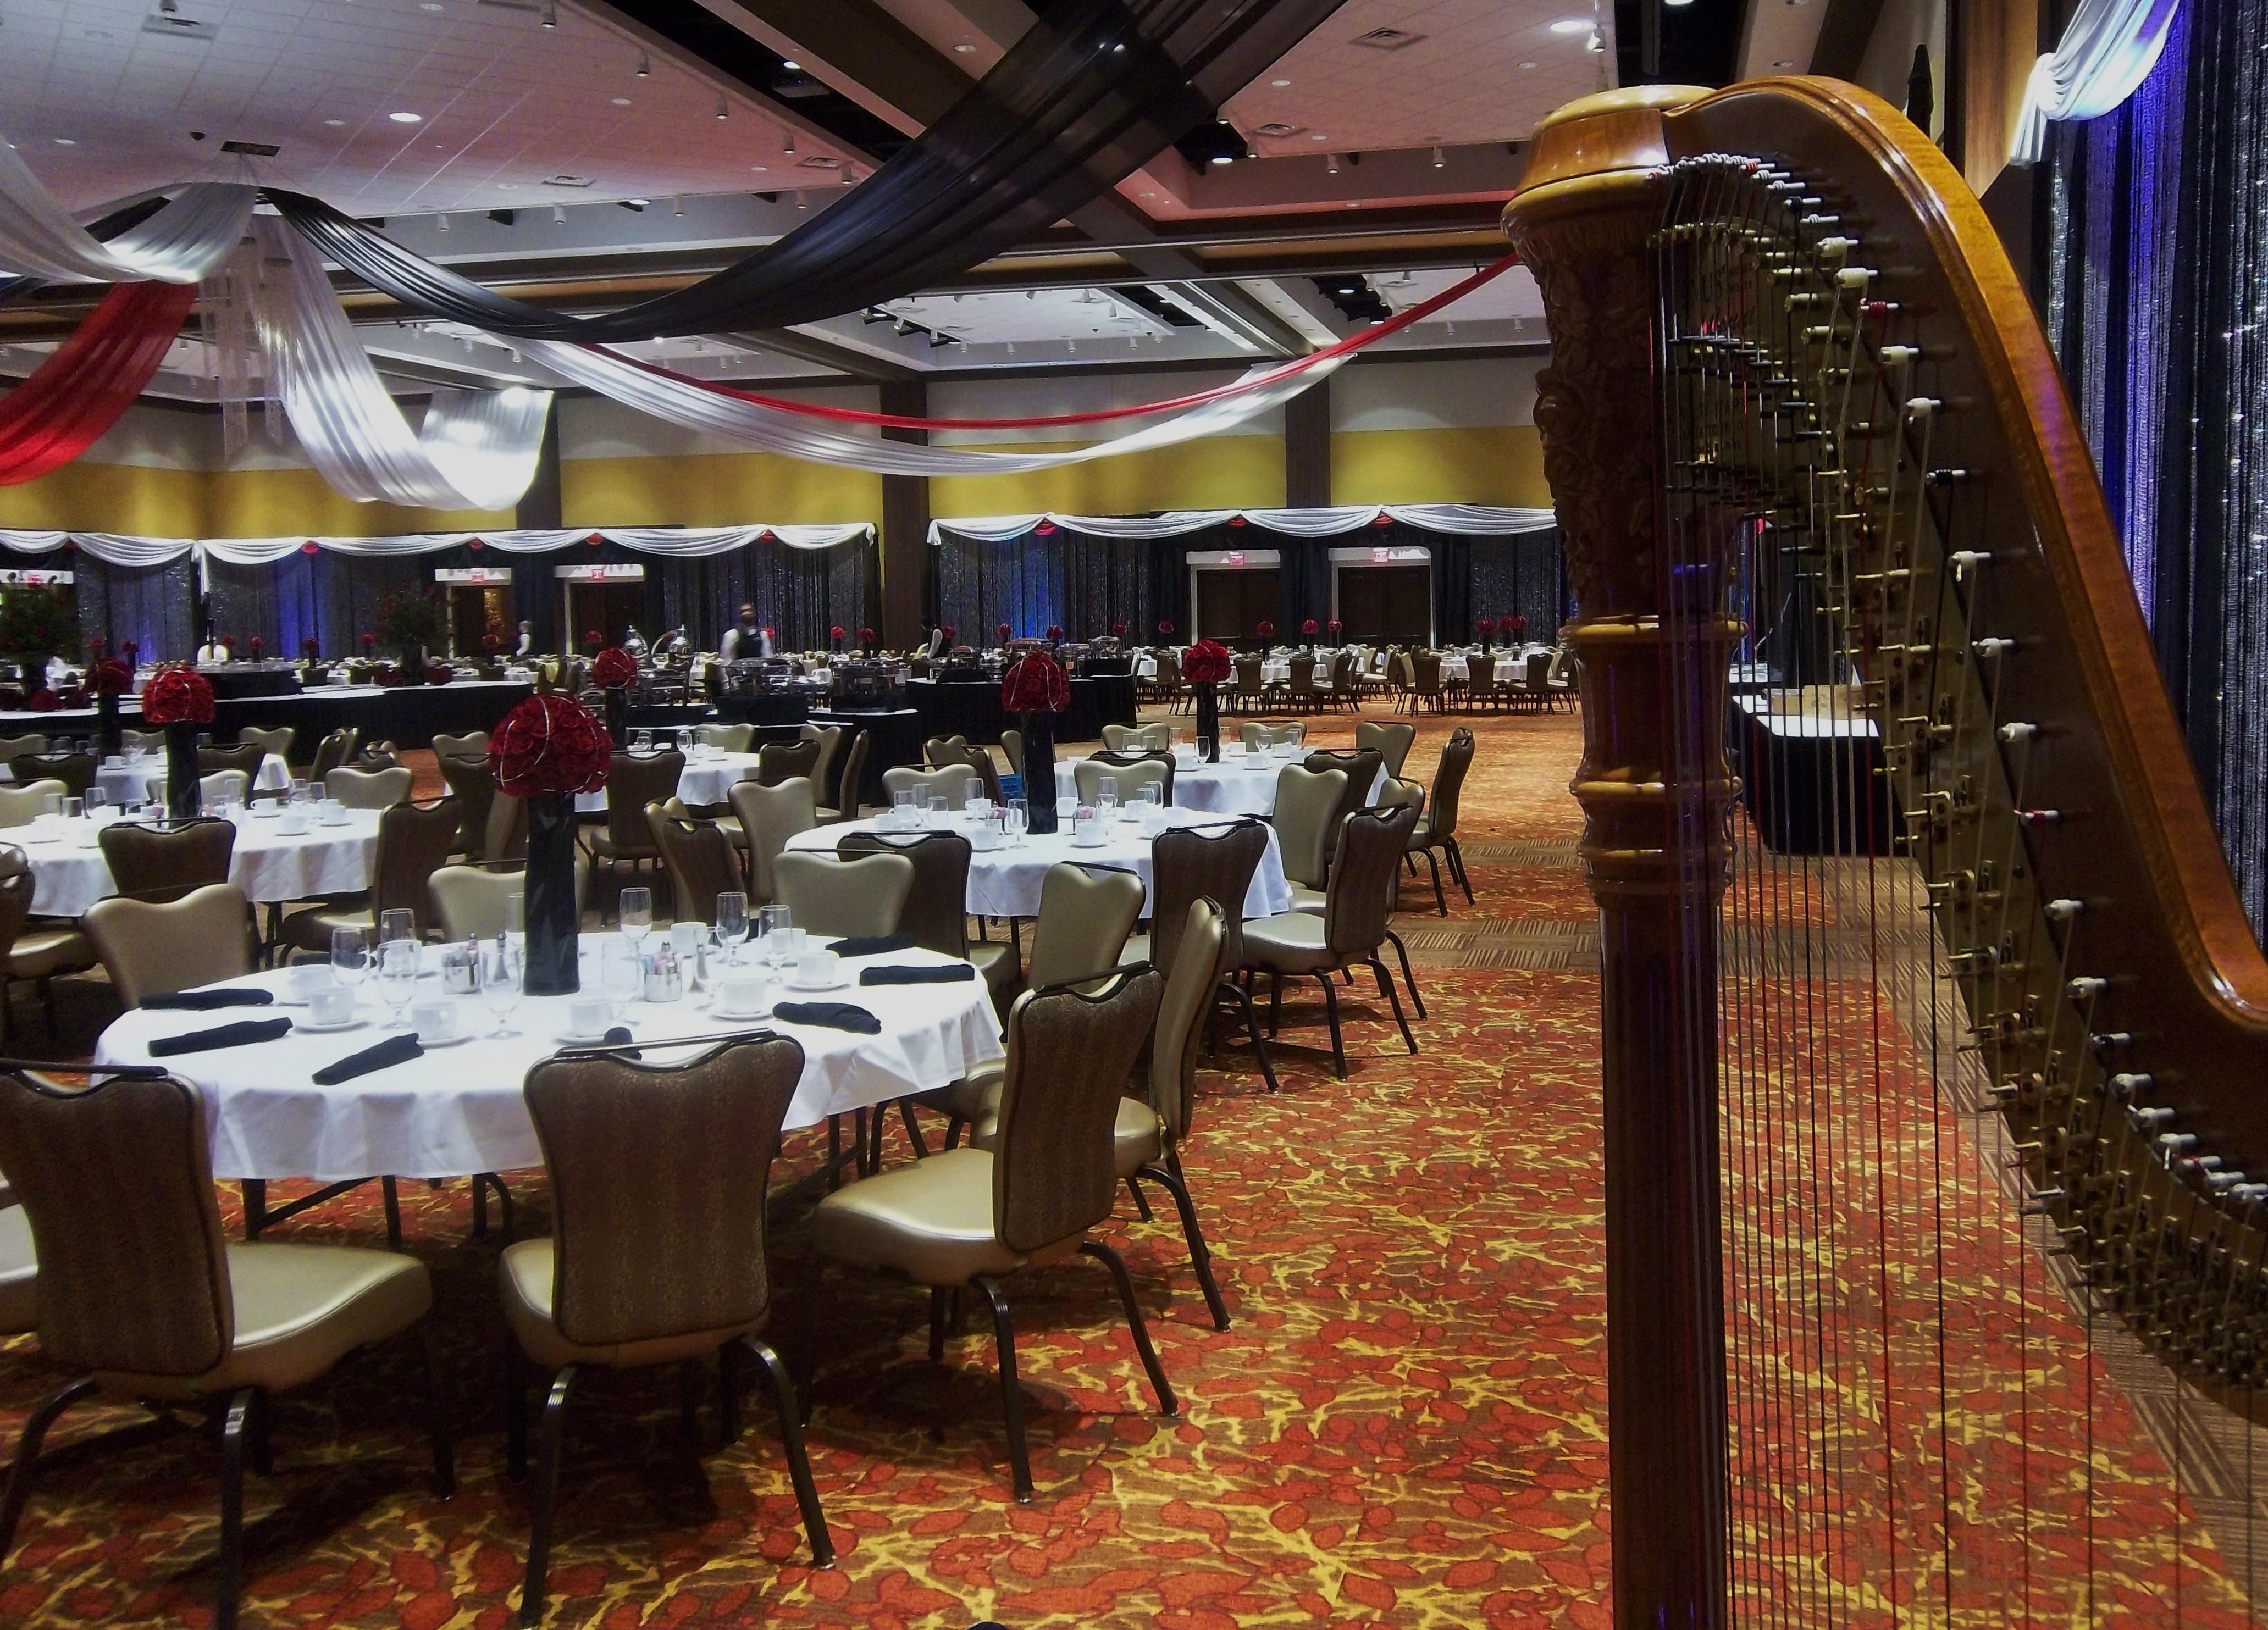 Four winds hotel casino free usa no deposit casino codes